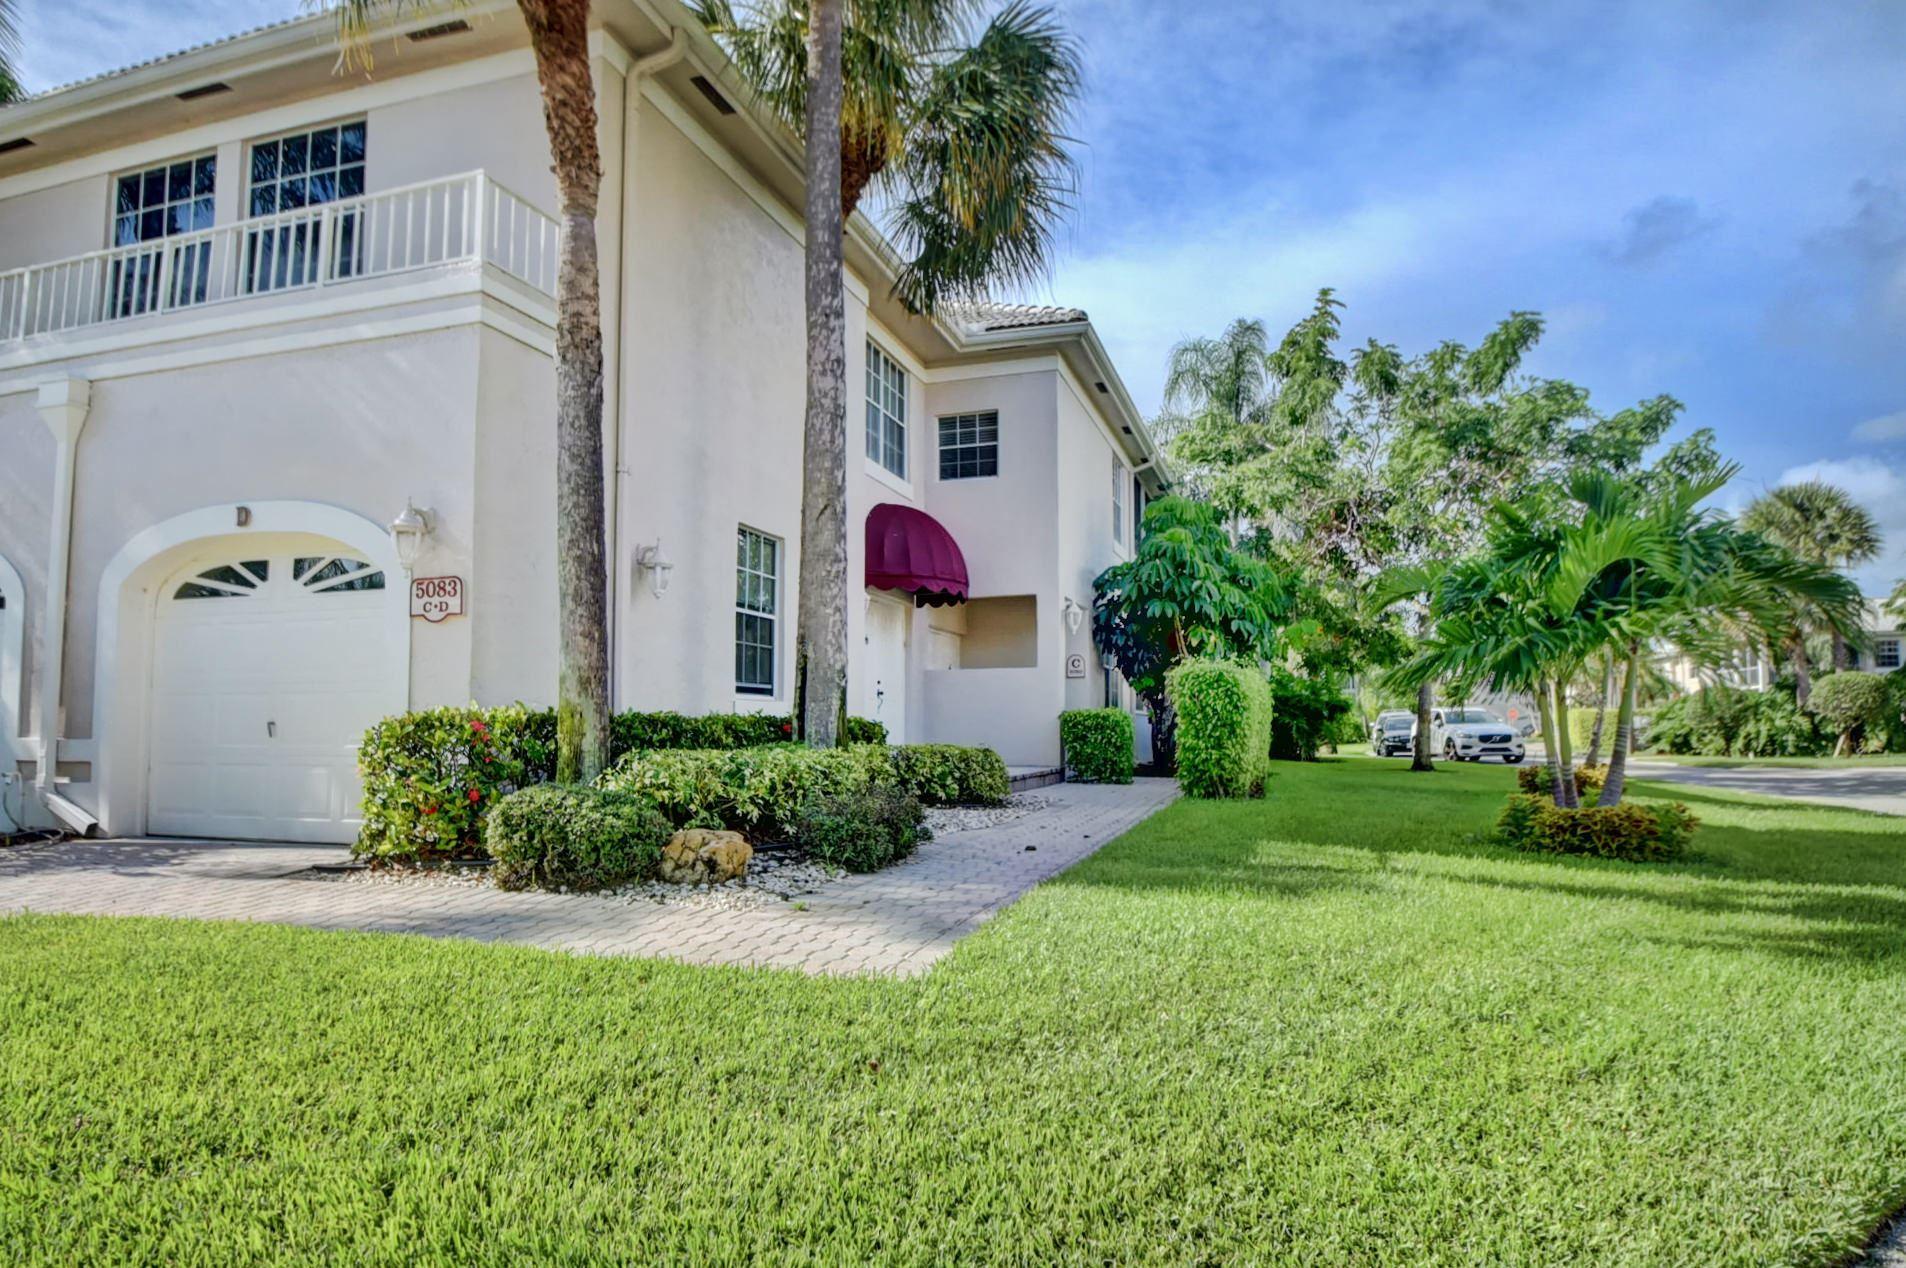 5083 Lake Catalina Drive #D, Boca Raton, FL 33496 - #: RX-10638614